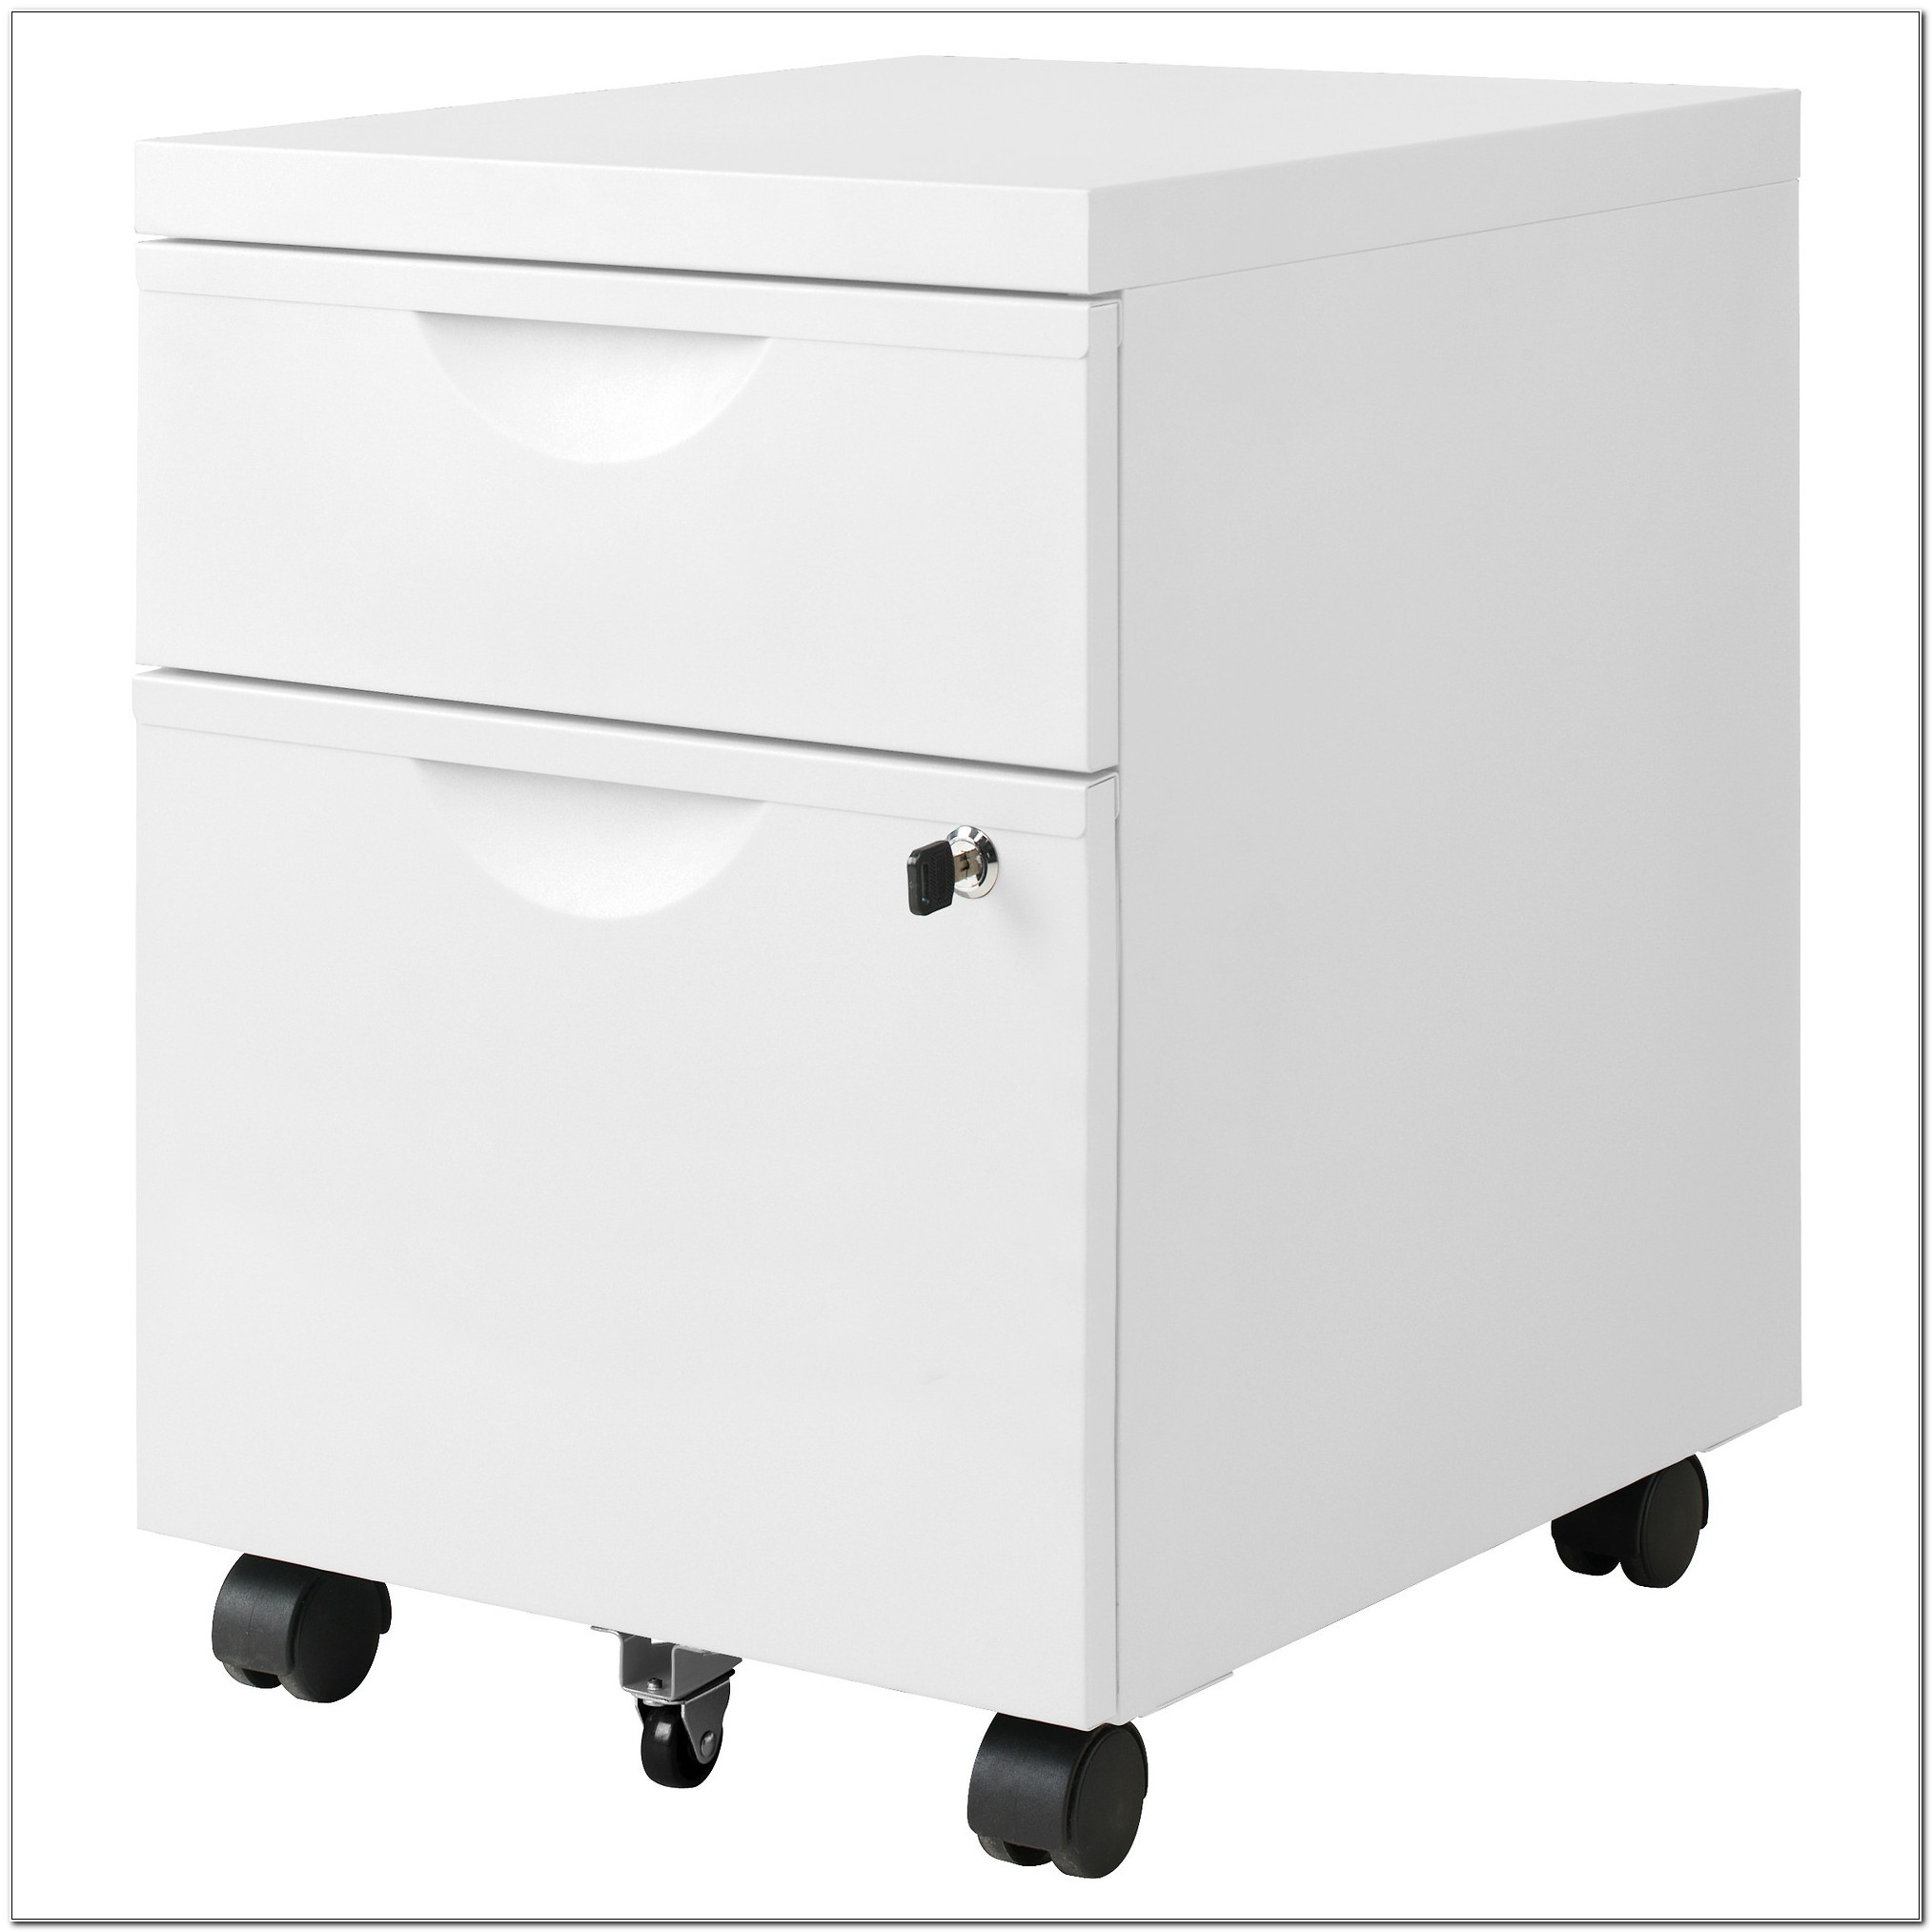 Ikea Black 2 Drawer Filing Cabinets